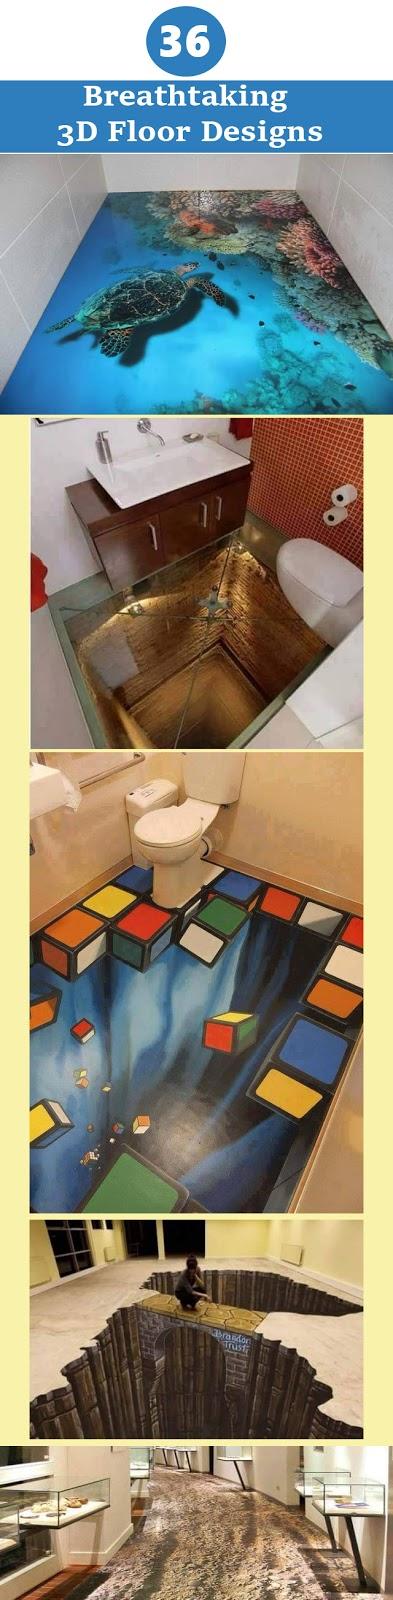 Modern Cost Effective and  Amazing 3D Floor Designs